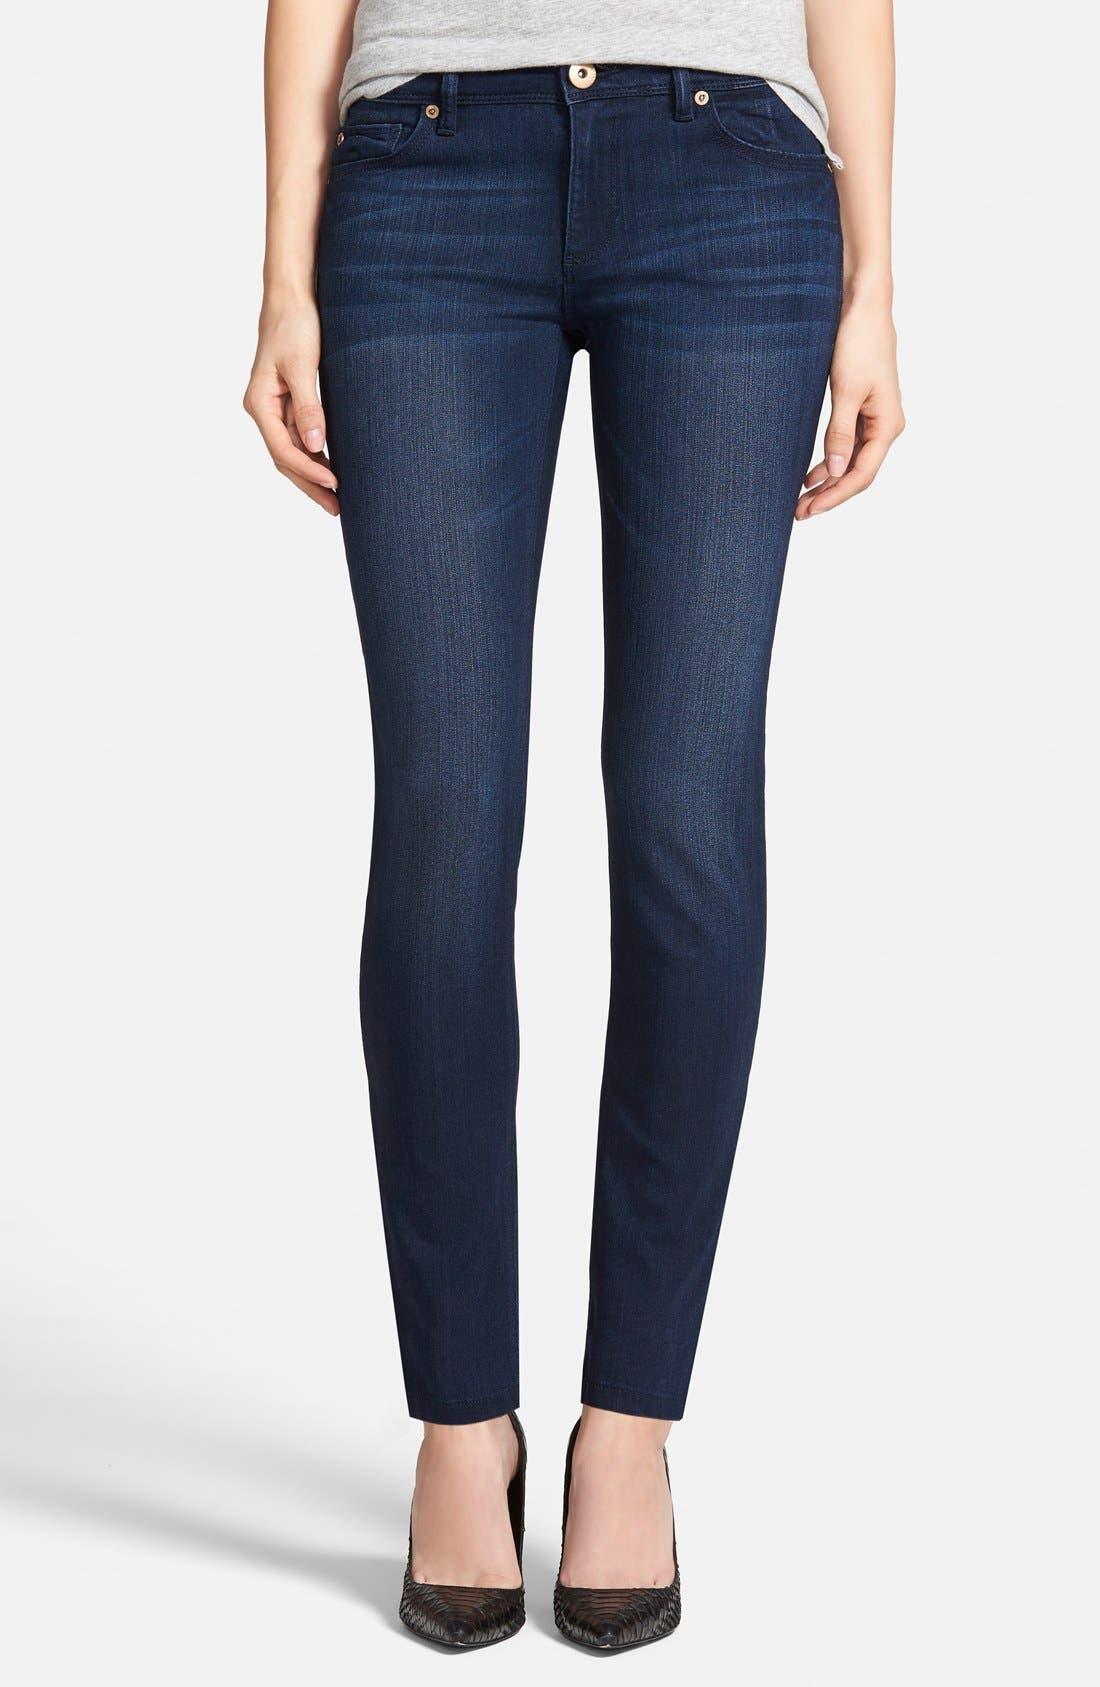 Alternate Image 1 Selected - DL1961 'Emma' Power Legging Jeans (Berlin)